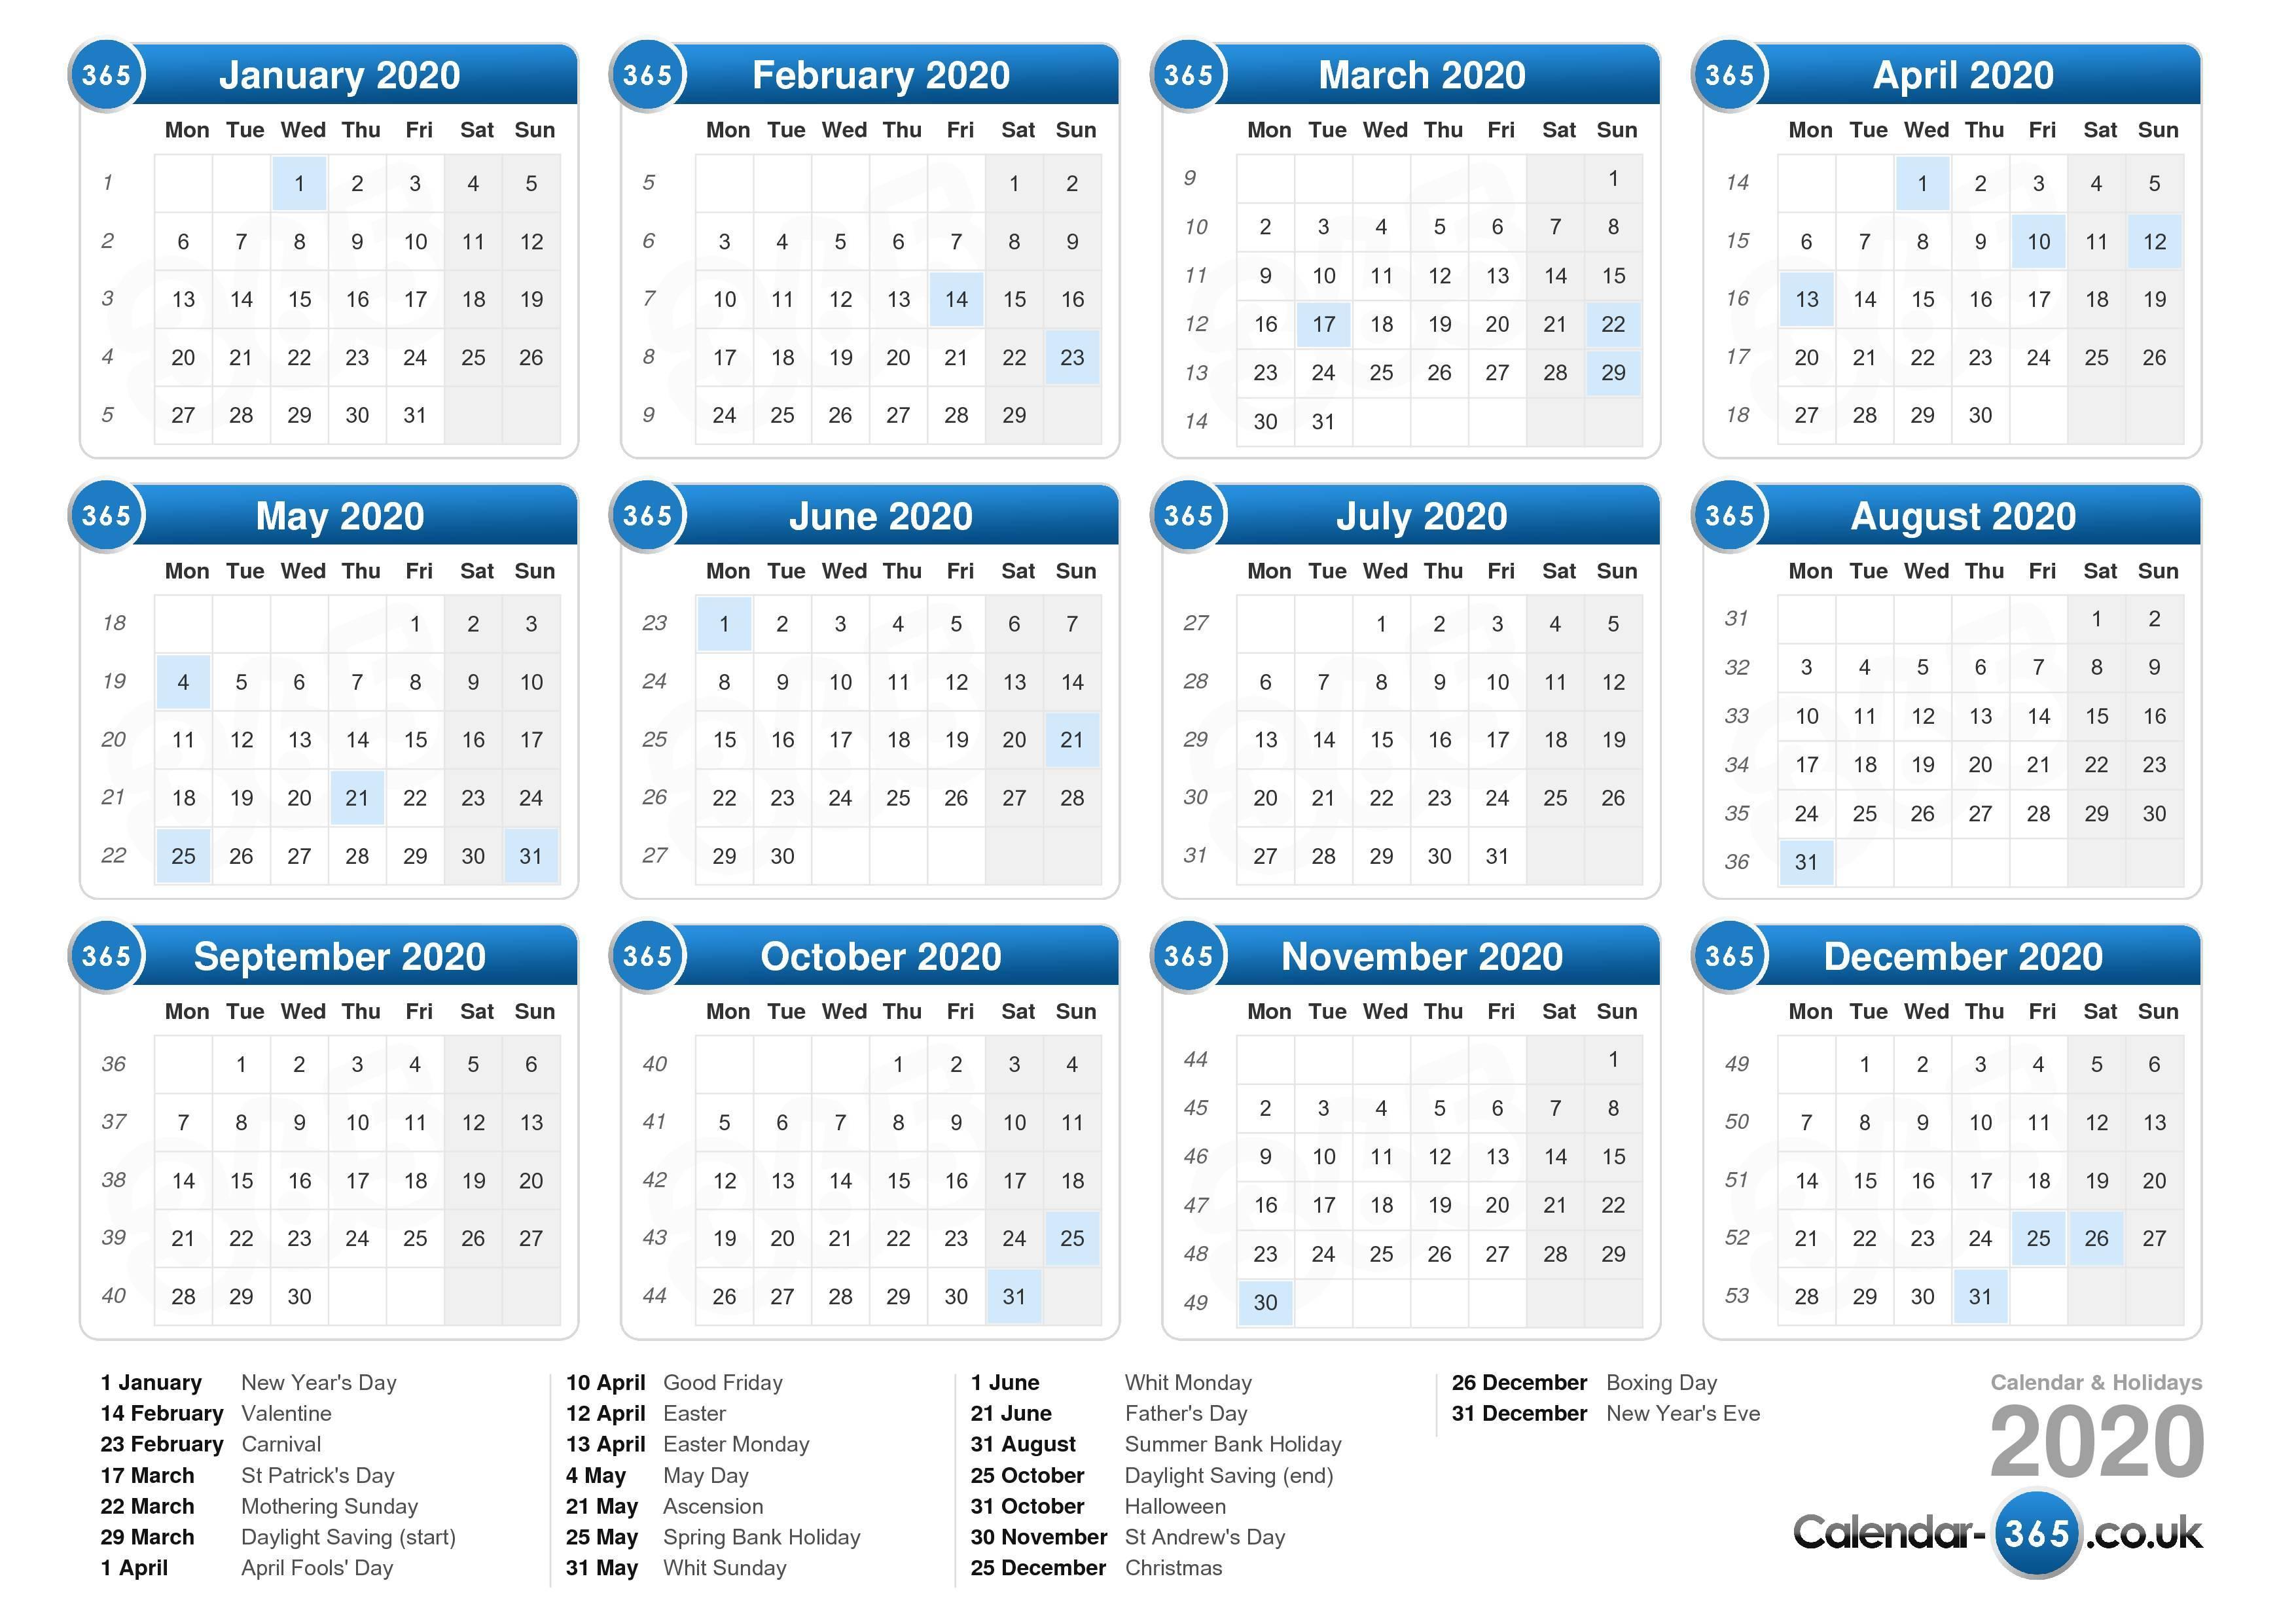 View A December 2020 Calendar With Holidays Calendar 2020